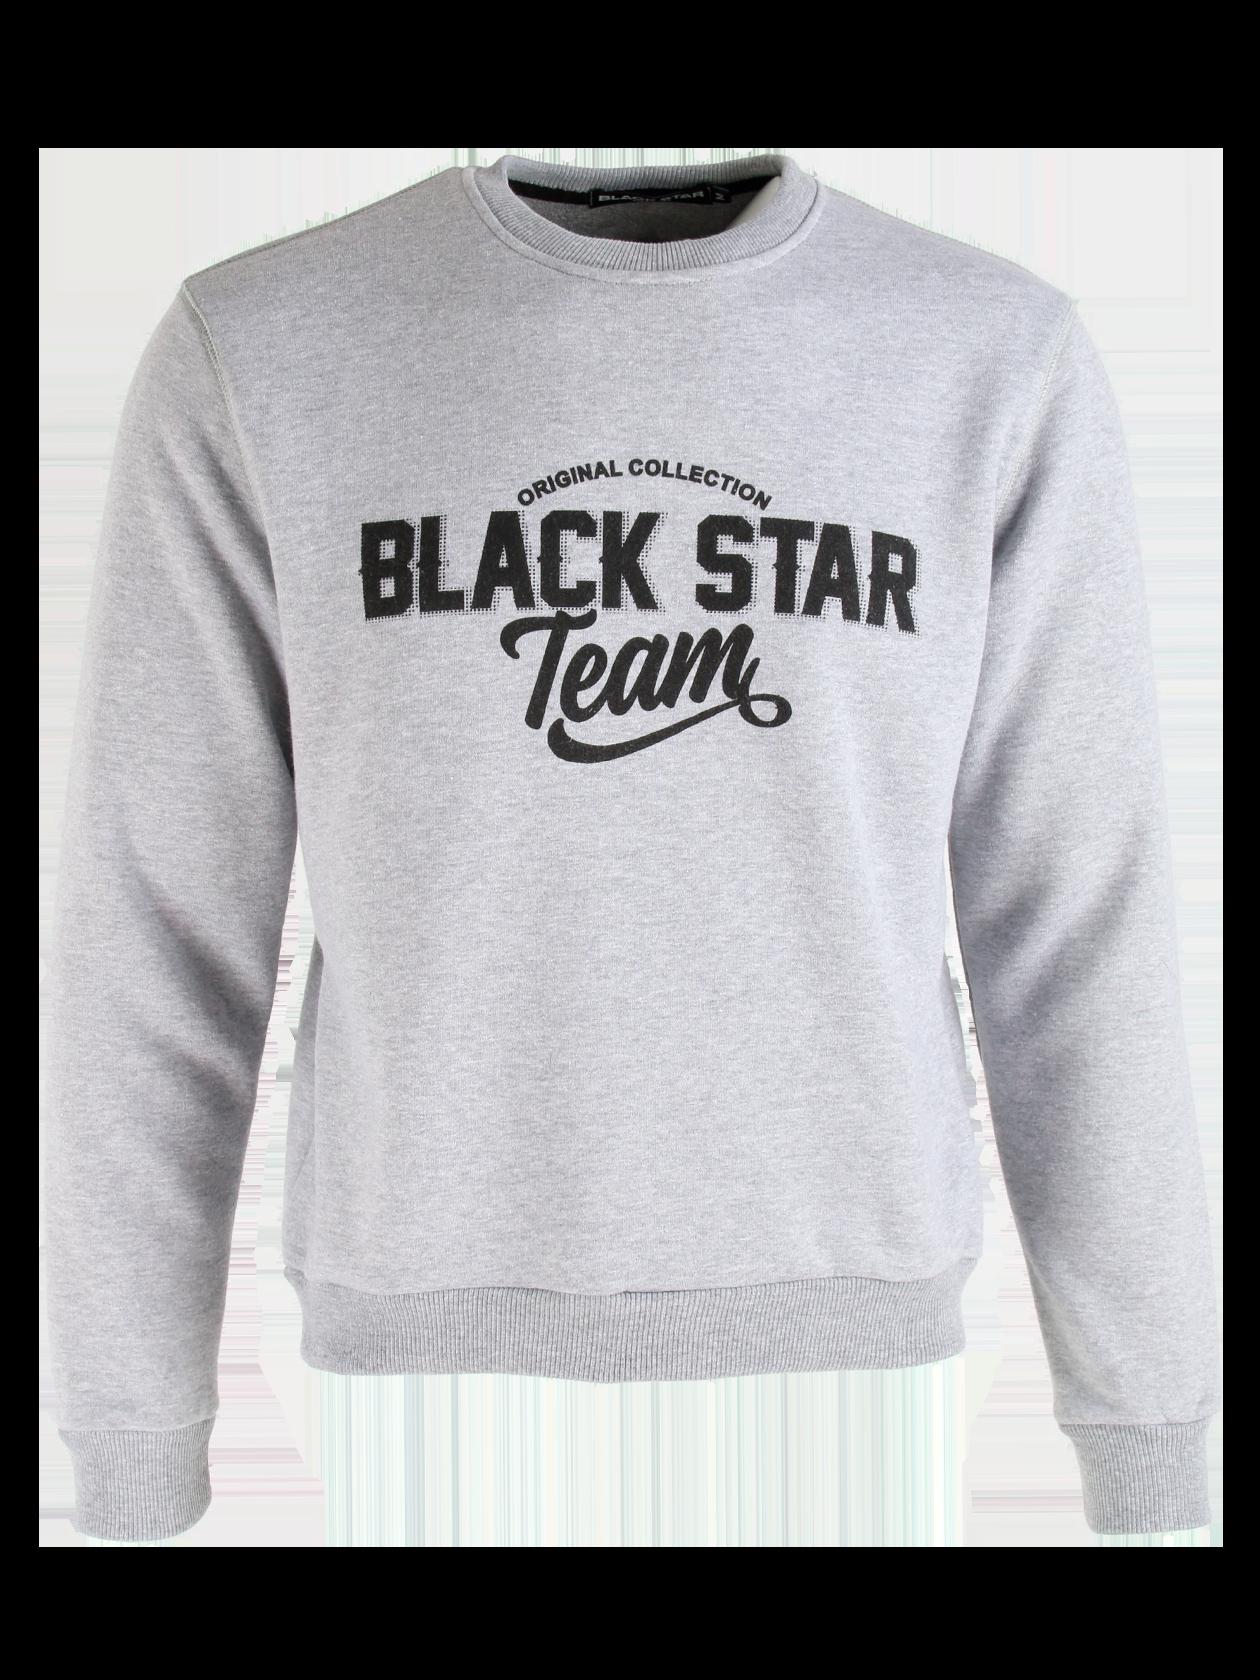 Костюм спортивный мужской Black Star Team